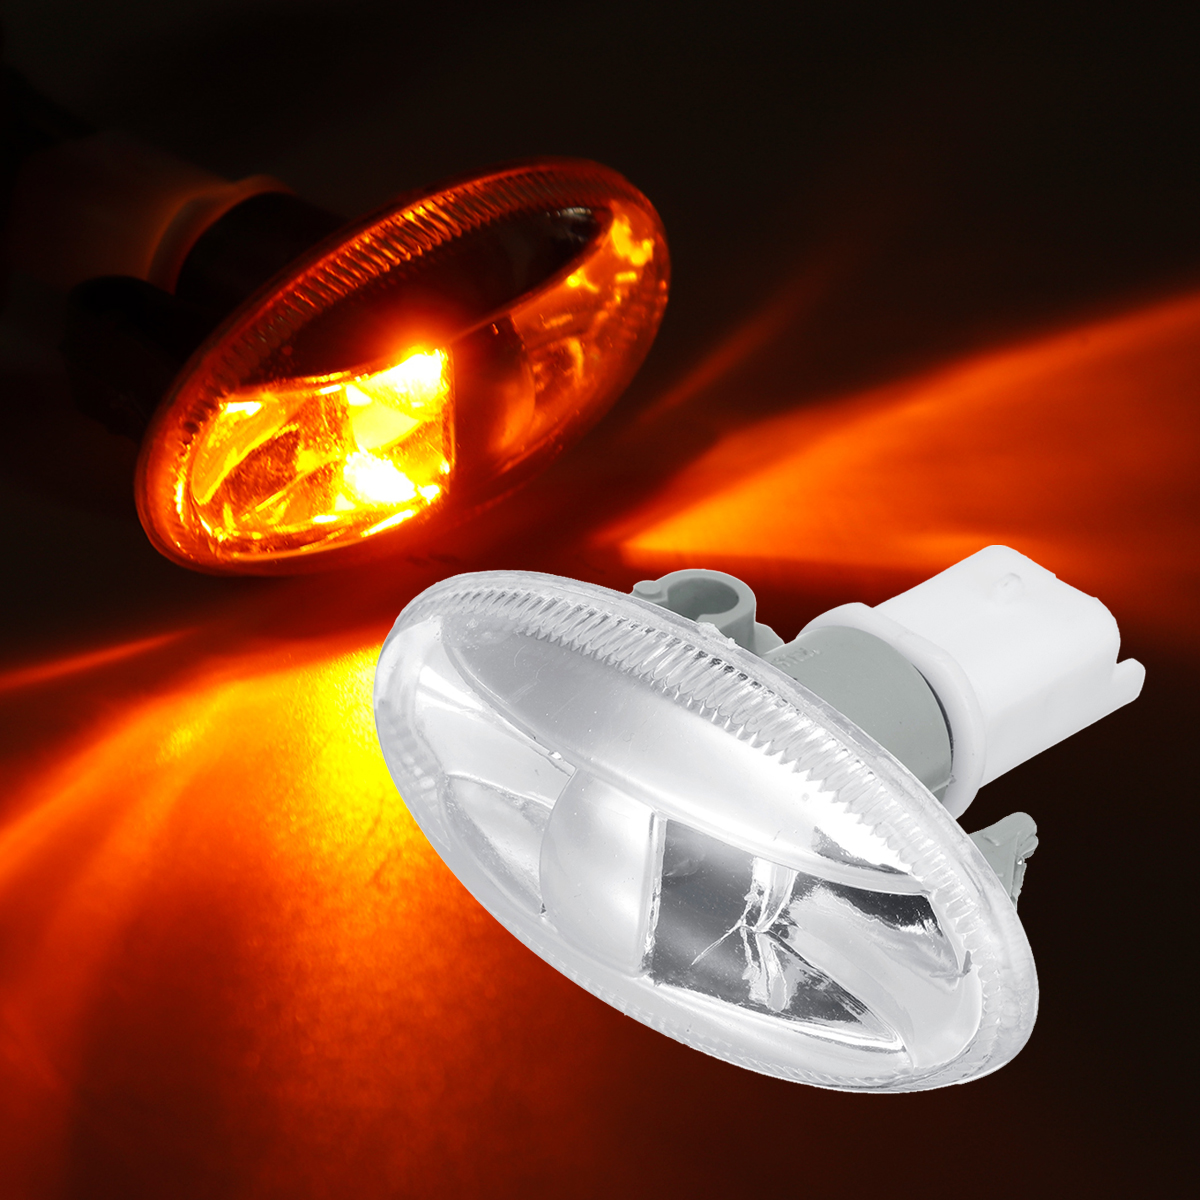 Car Auto Turn Signal Indicator Partner Side Marker Light Lamp For Peugeot 108 107 407 206 1007 Amber